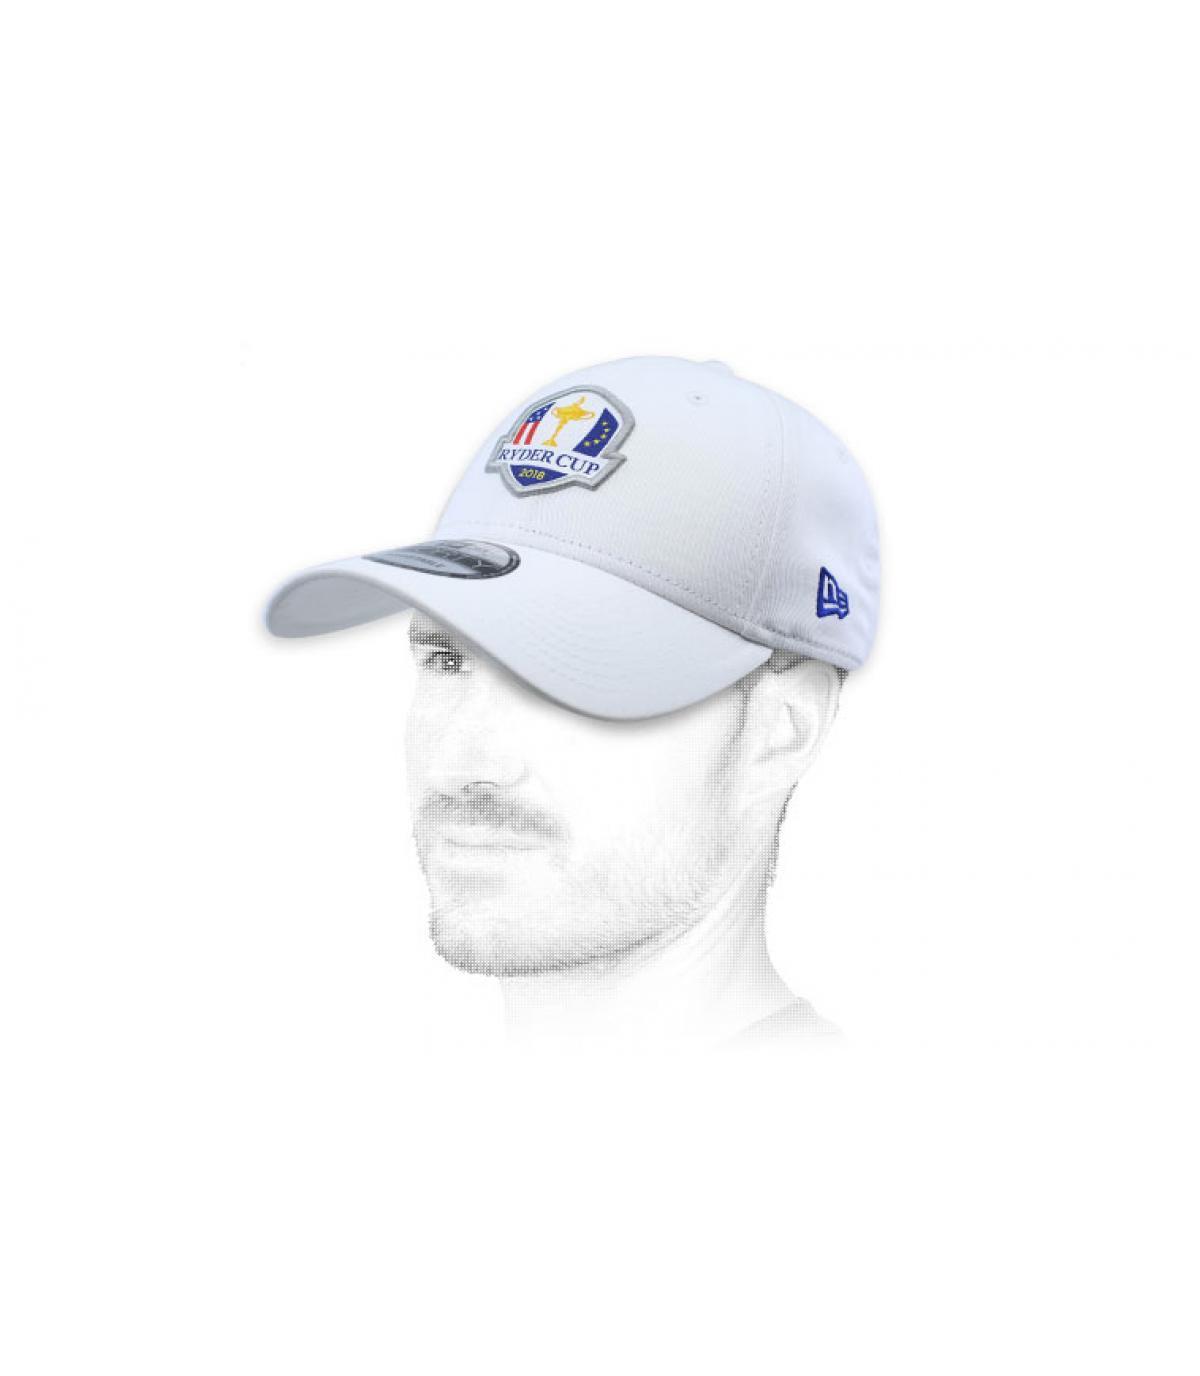 white Ryder Cup golf cap